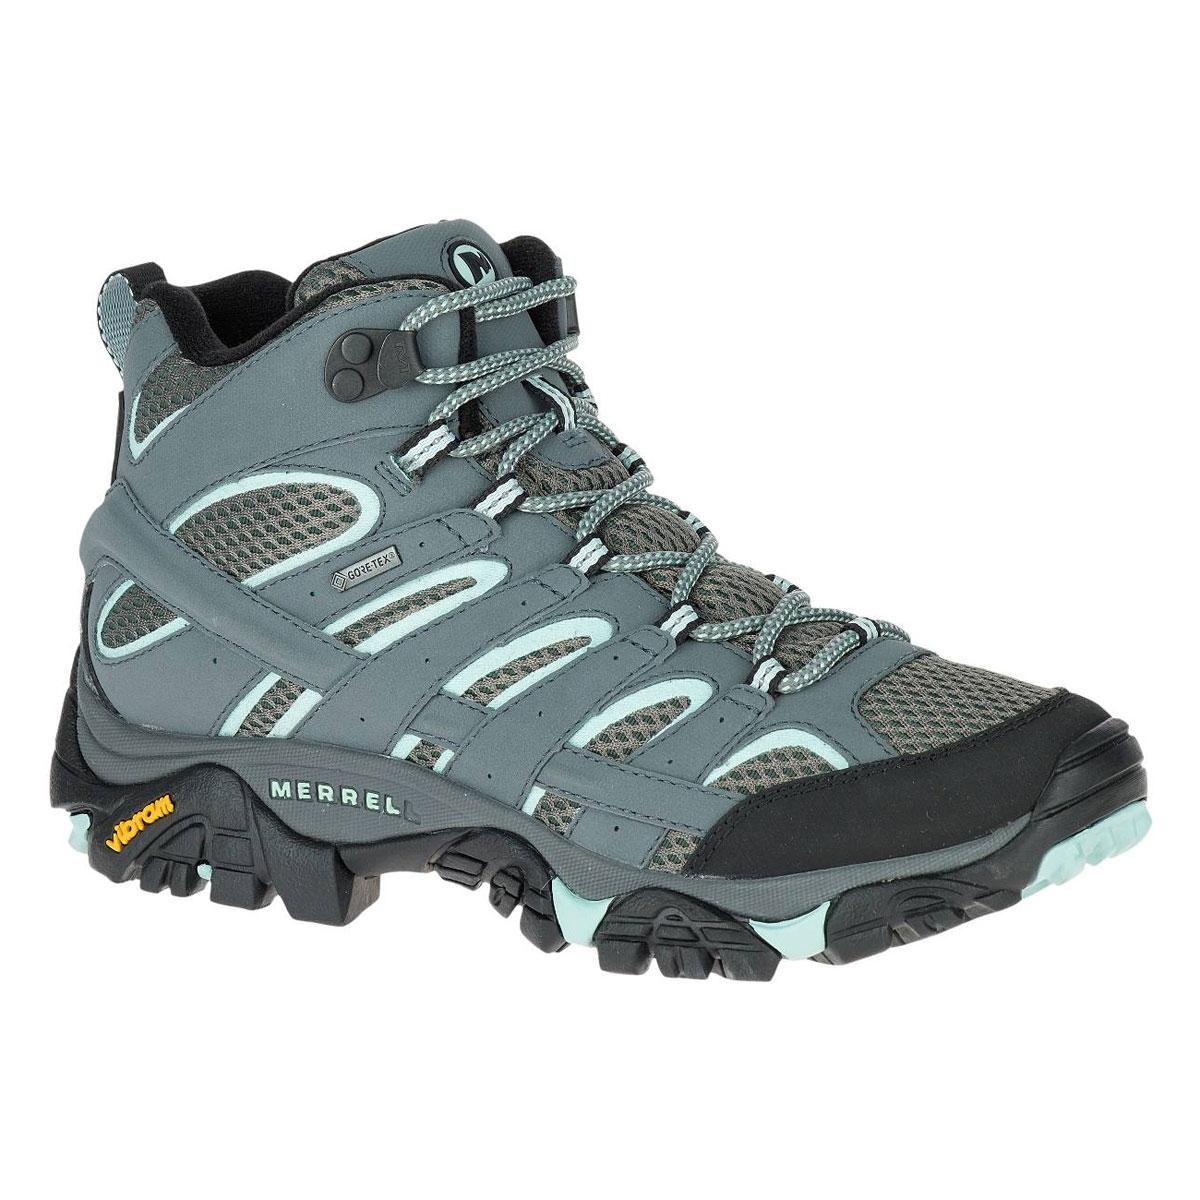 Merrell Moab 2 MID GTX Shoes Women black UK 4 prvPCJTYwL